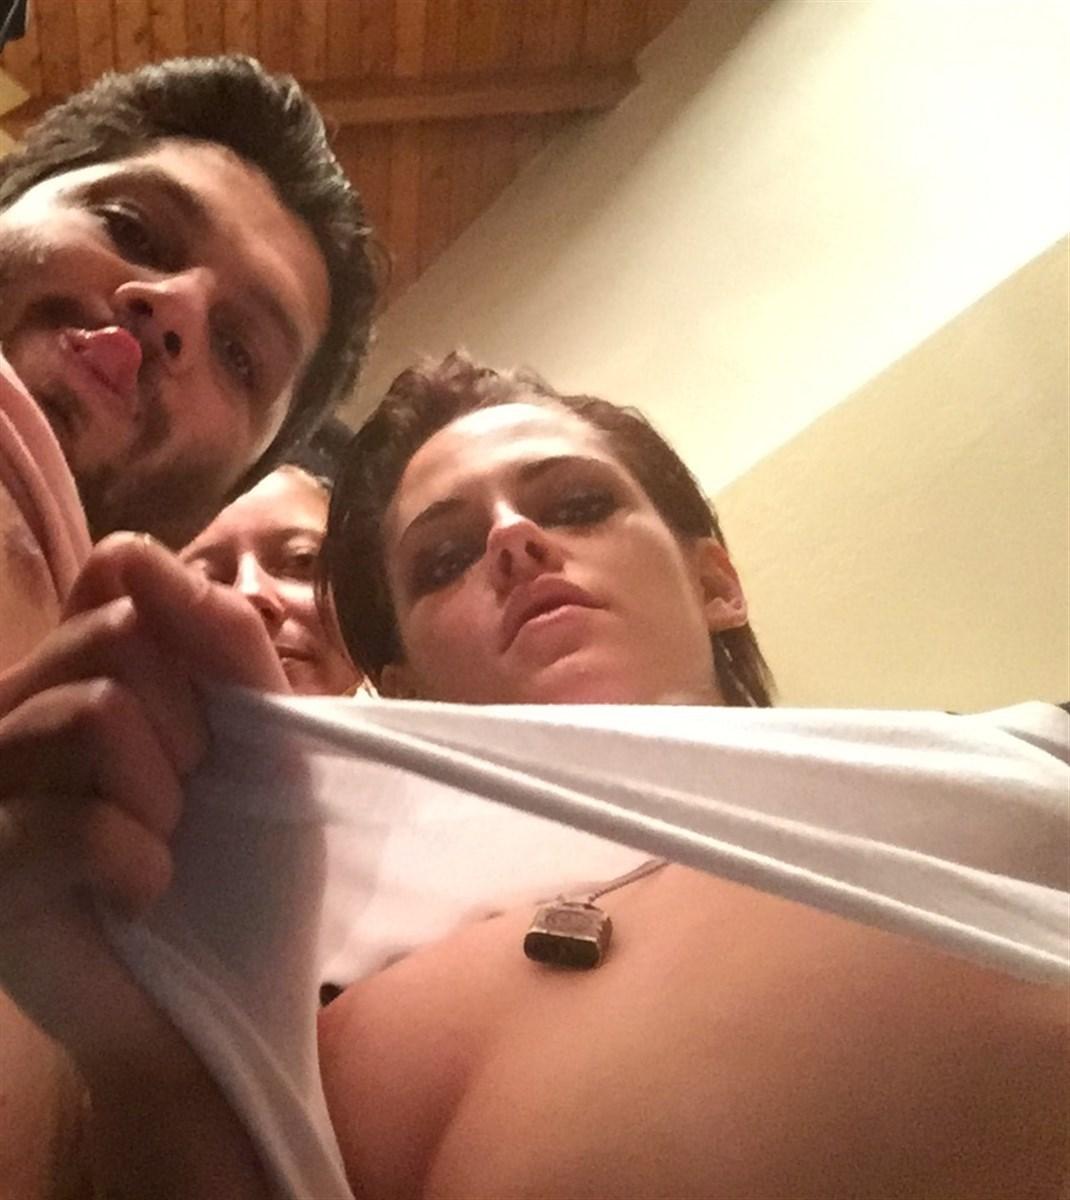 kristen-stewart-nude-leaked-photos